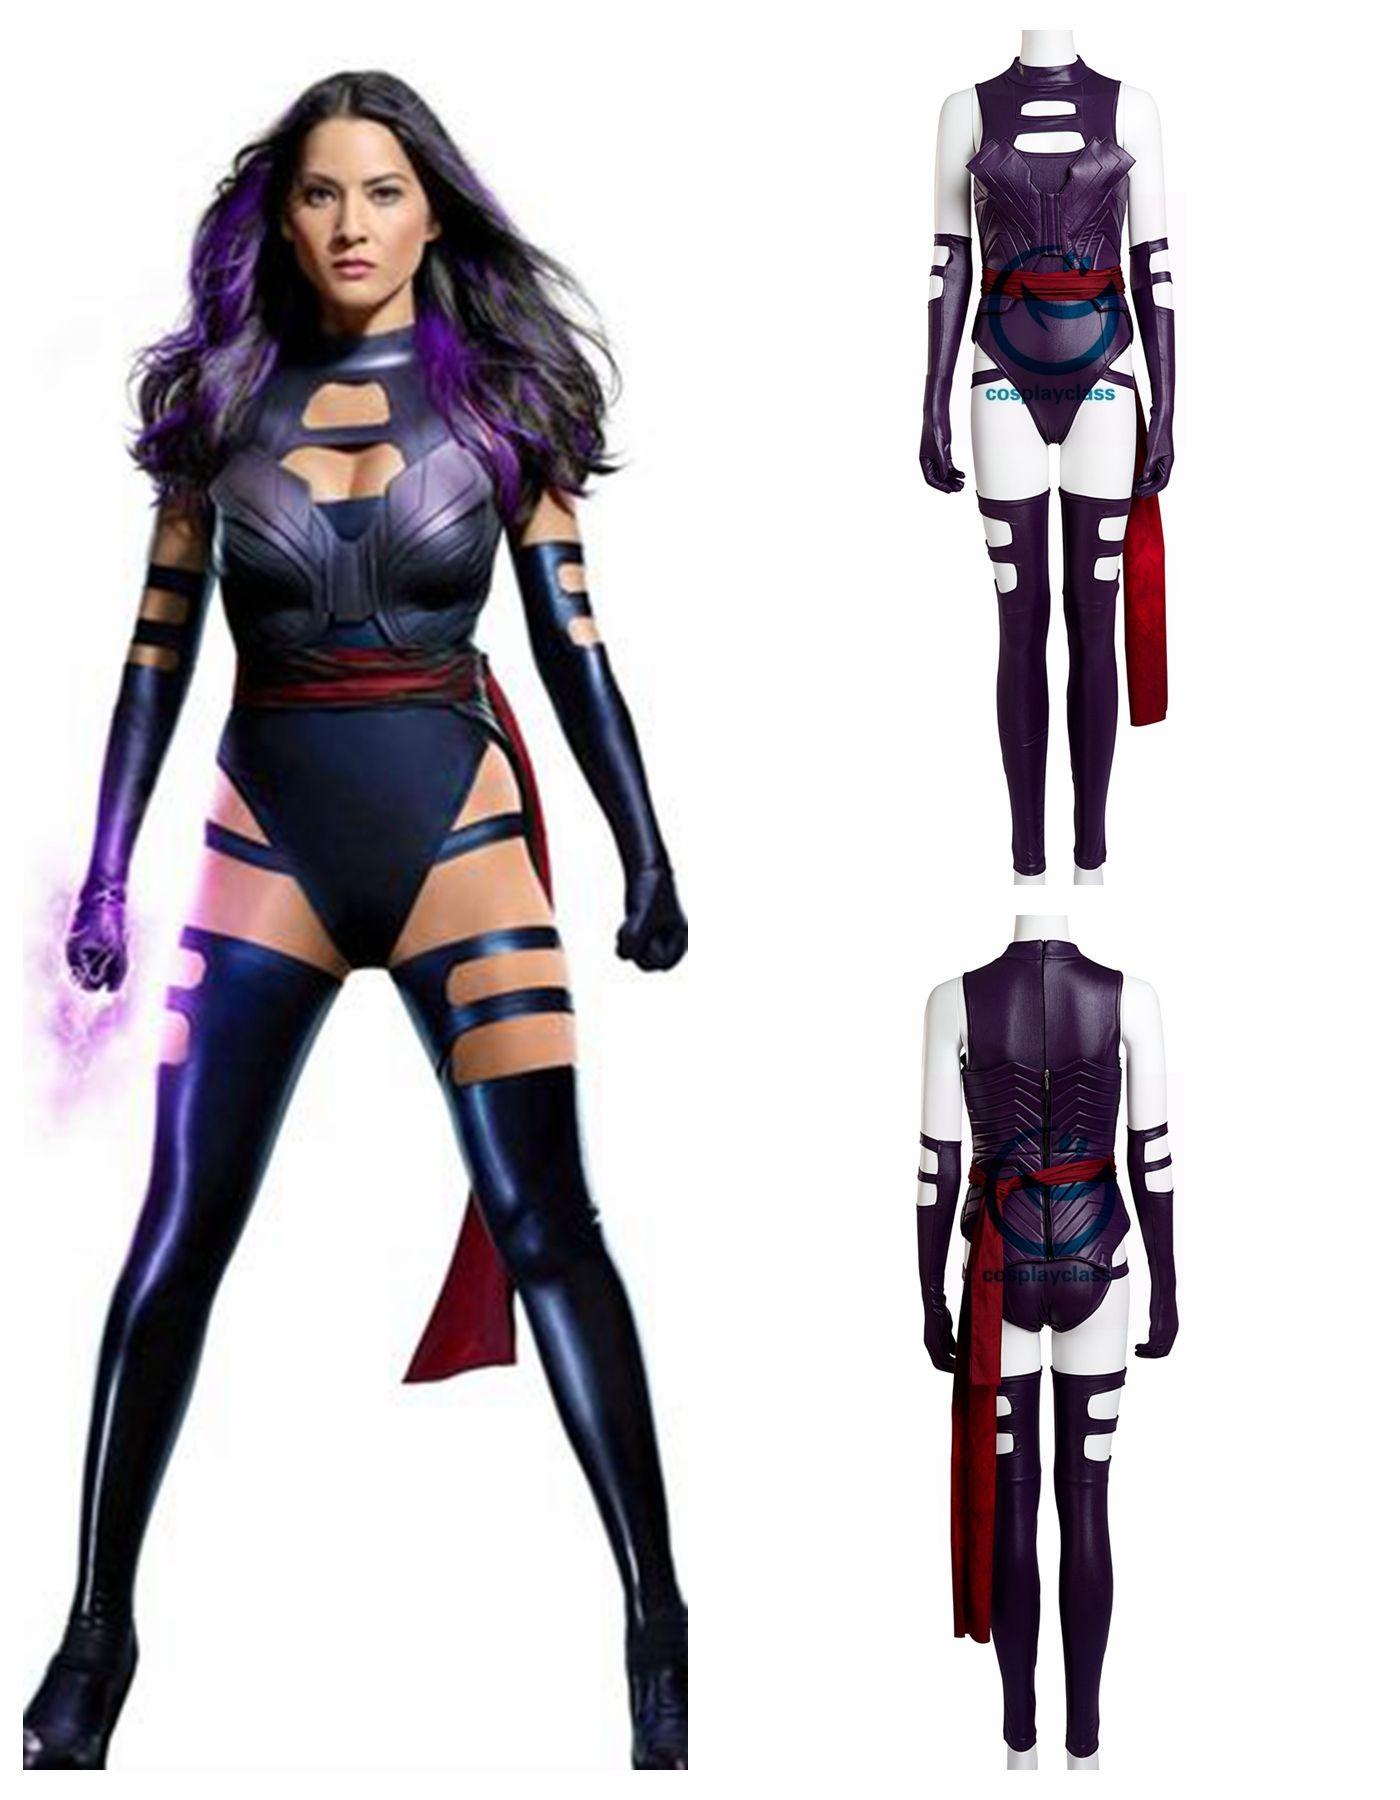 37a43a2dfb08ff Psylocke from X-Men costume #OliviaMunn #Marvelcomic #cosplay #costume  #cosplayclass #comic #Psylocke